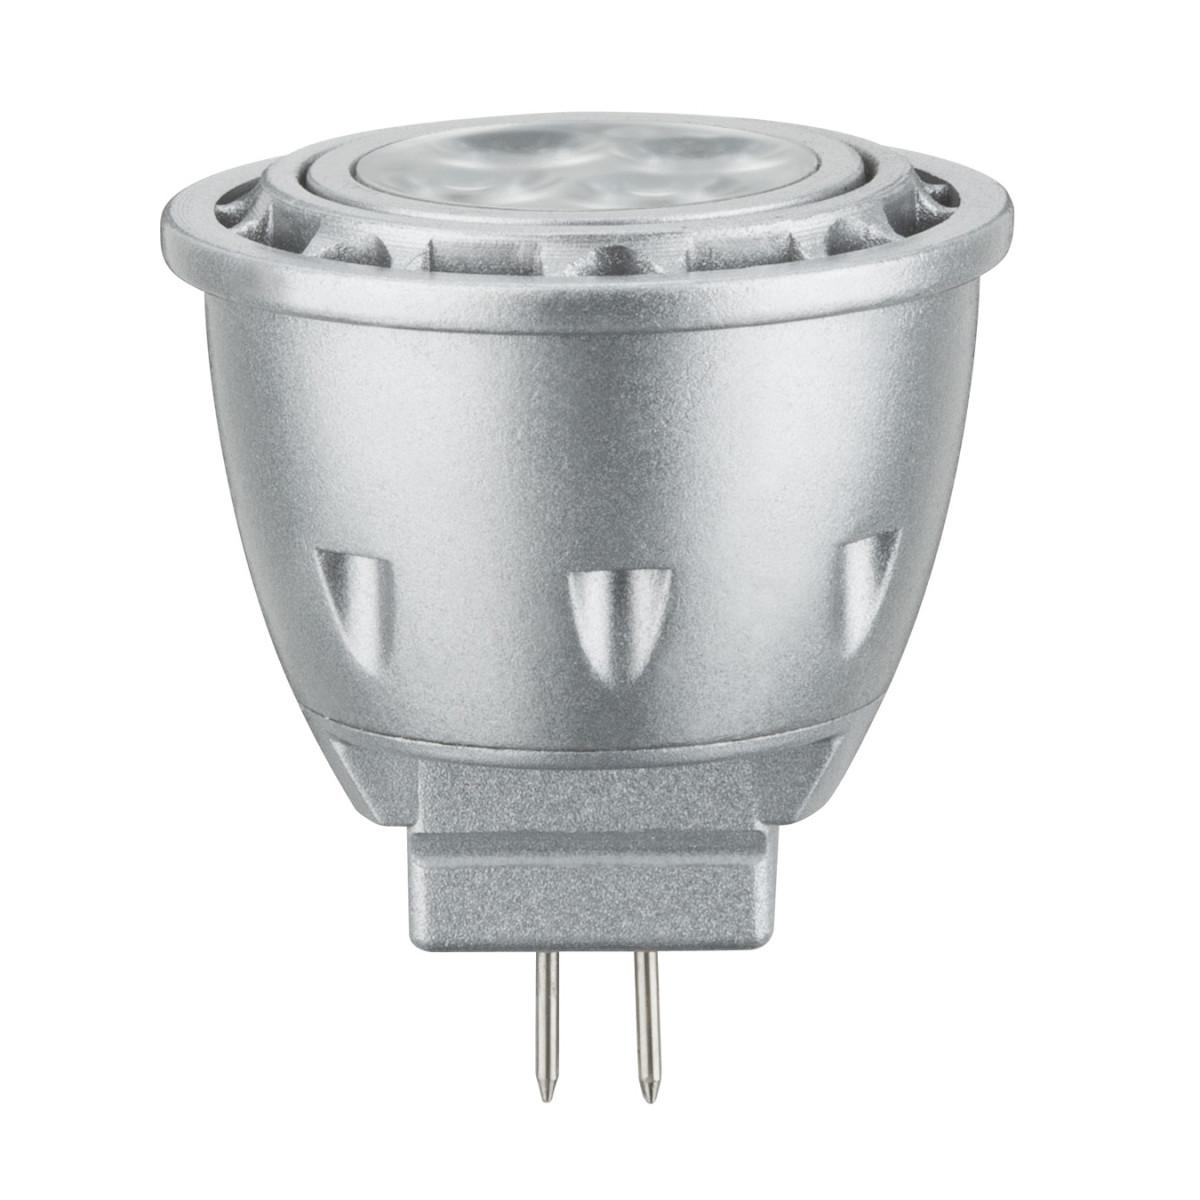 Лампа светодиодная Paulmann 28260 GU4 200 Лм теплый свет